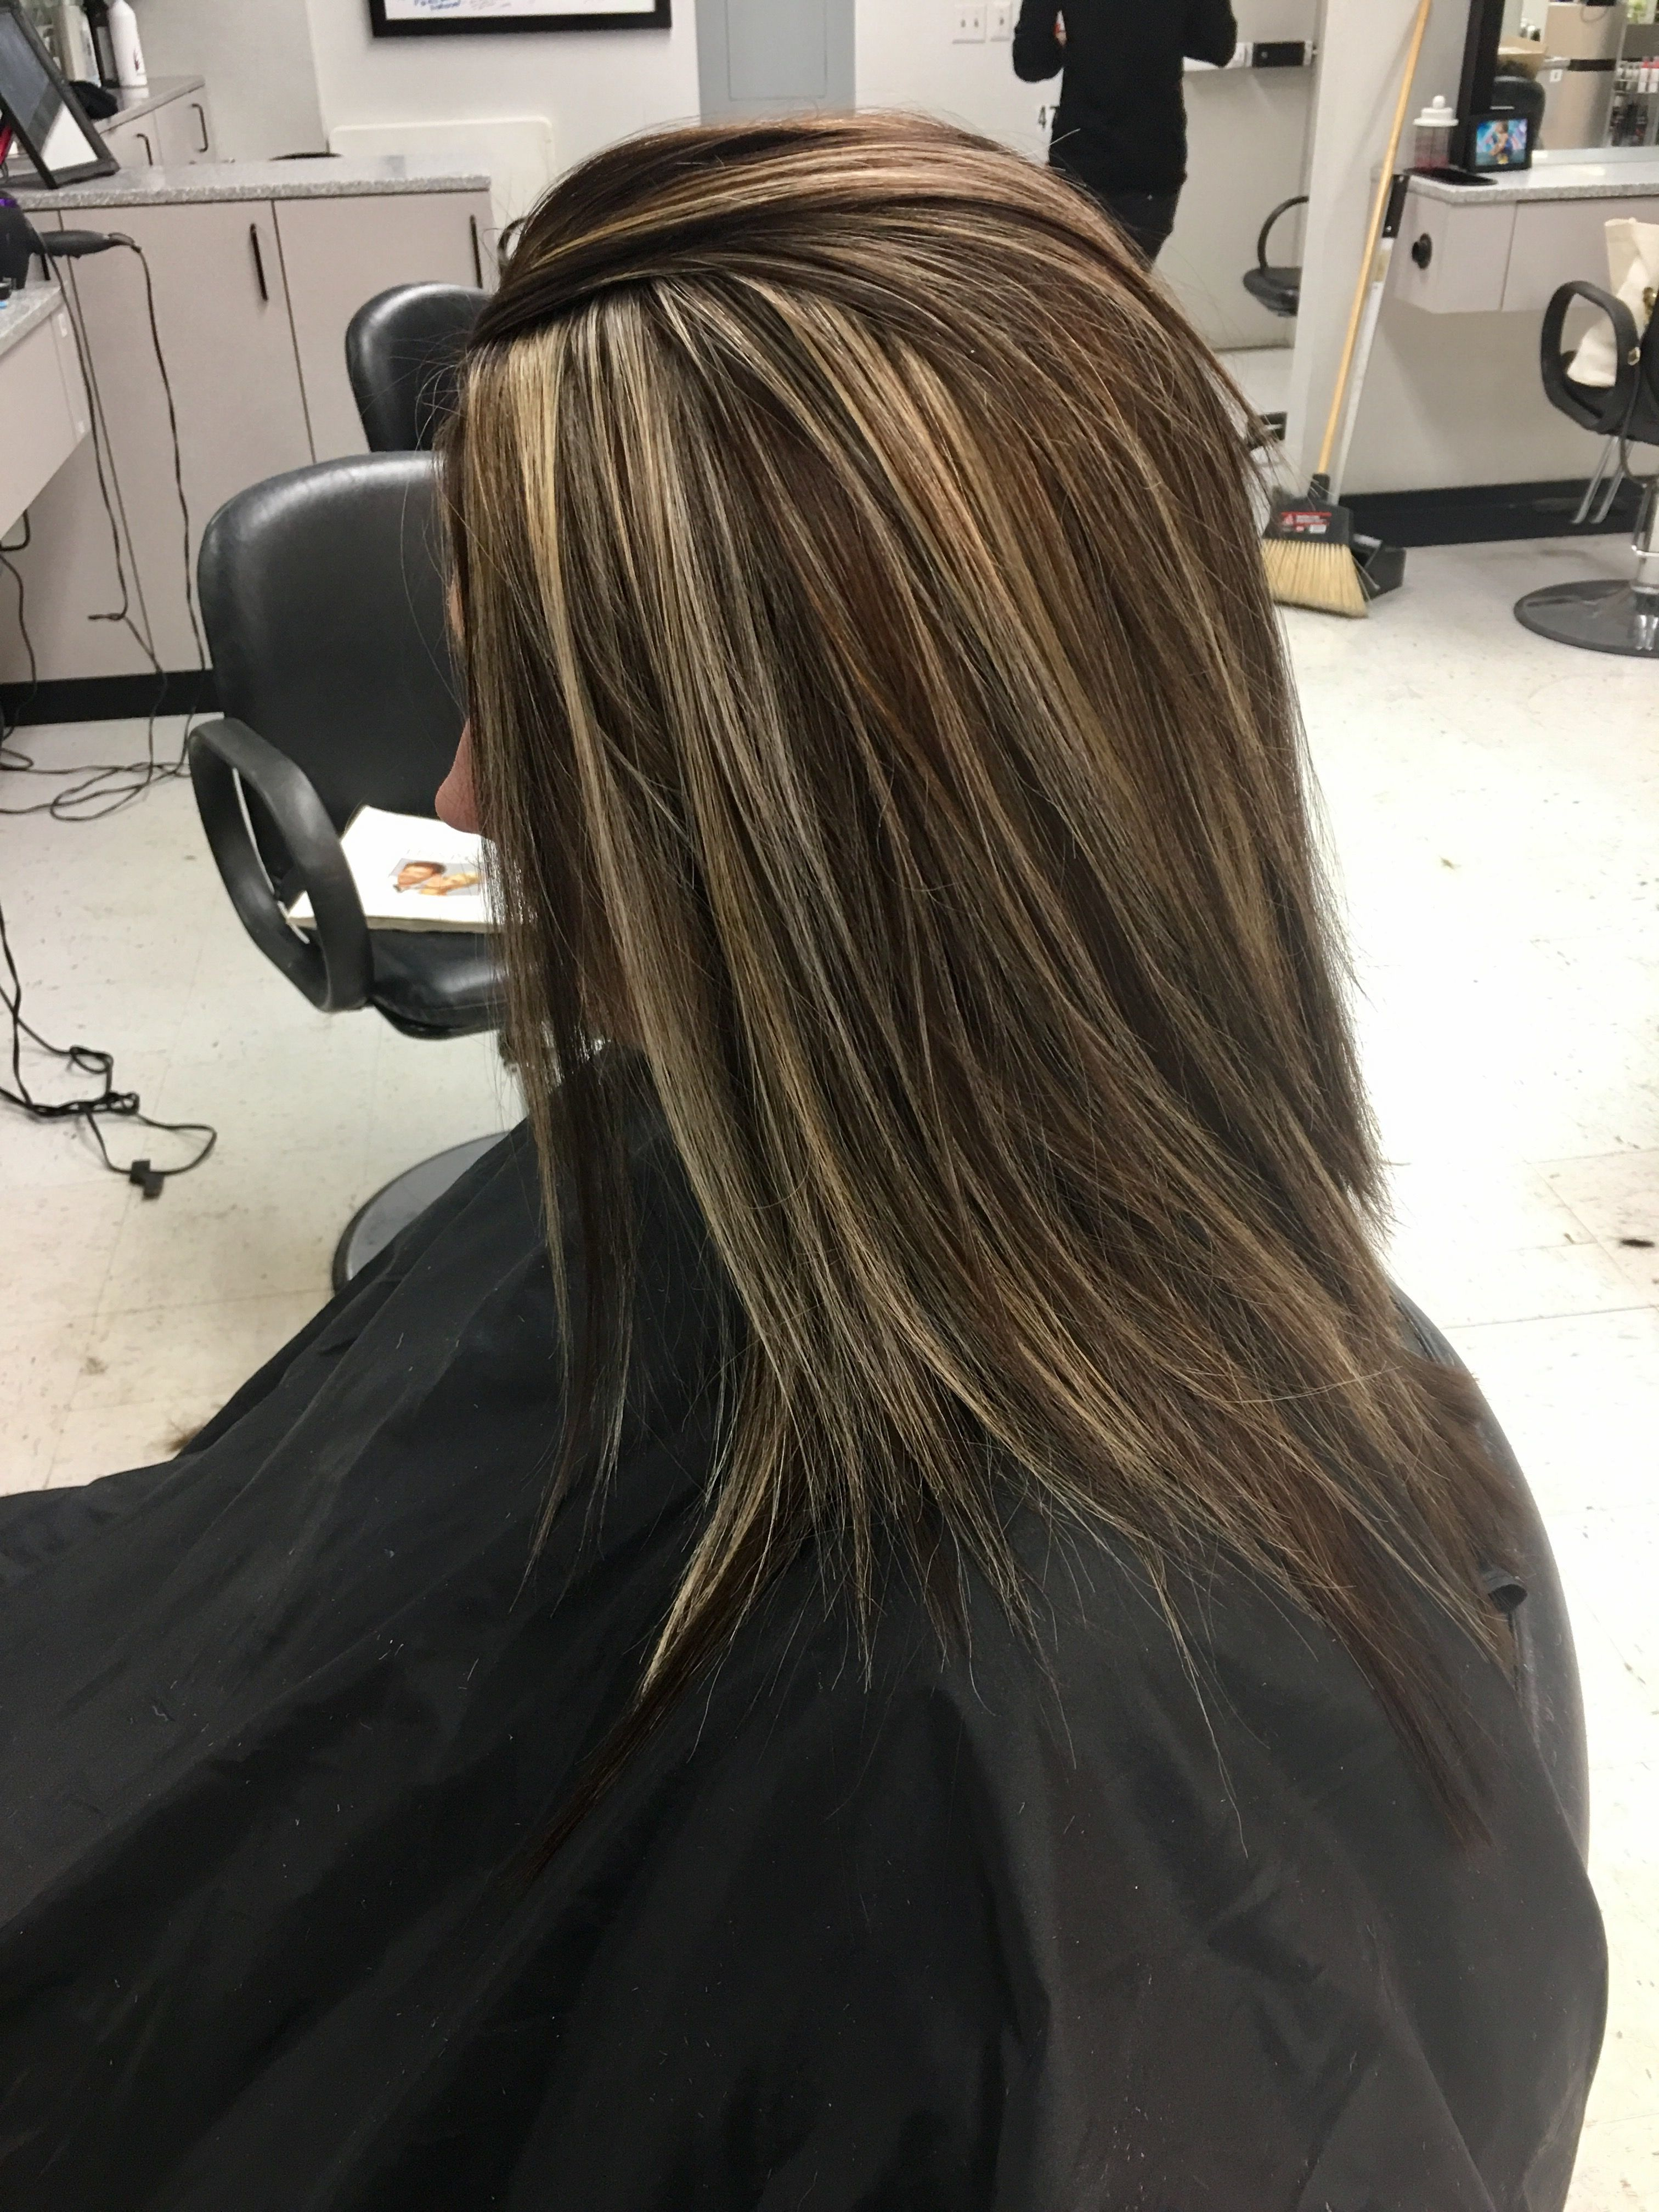 Brown Hair With Blonde Highlights Brown Hair With Blonde Highlights Brown Blonde Hair Blonde Highlights On Dark Hair